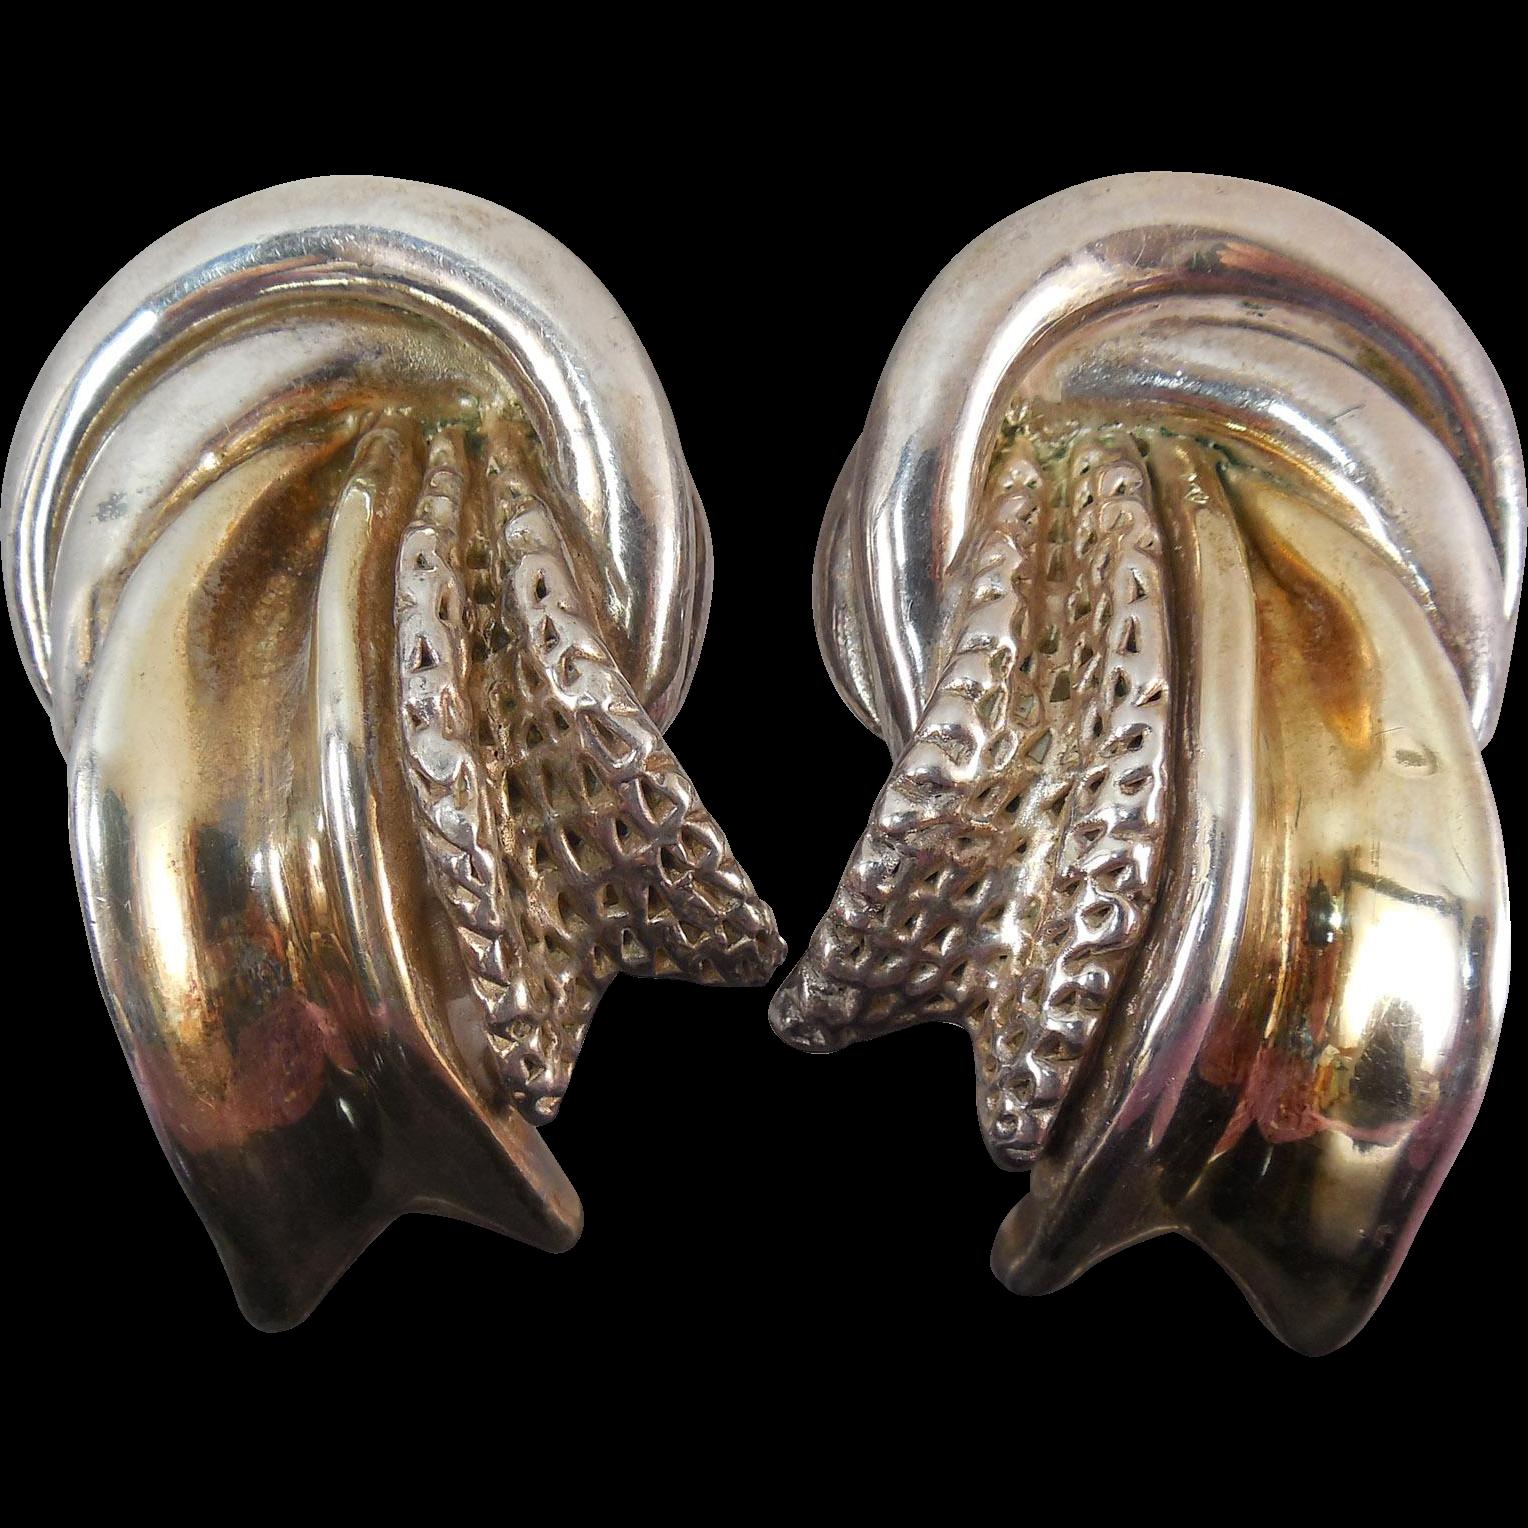 Statement Earrings - Huge Electroform Two Tone Sterling Silver 'Ribbon' Earrings - Signed! 29.6 Grams